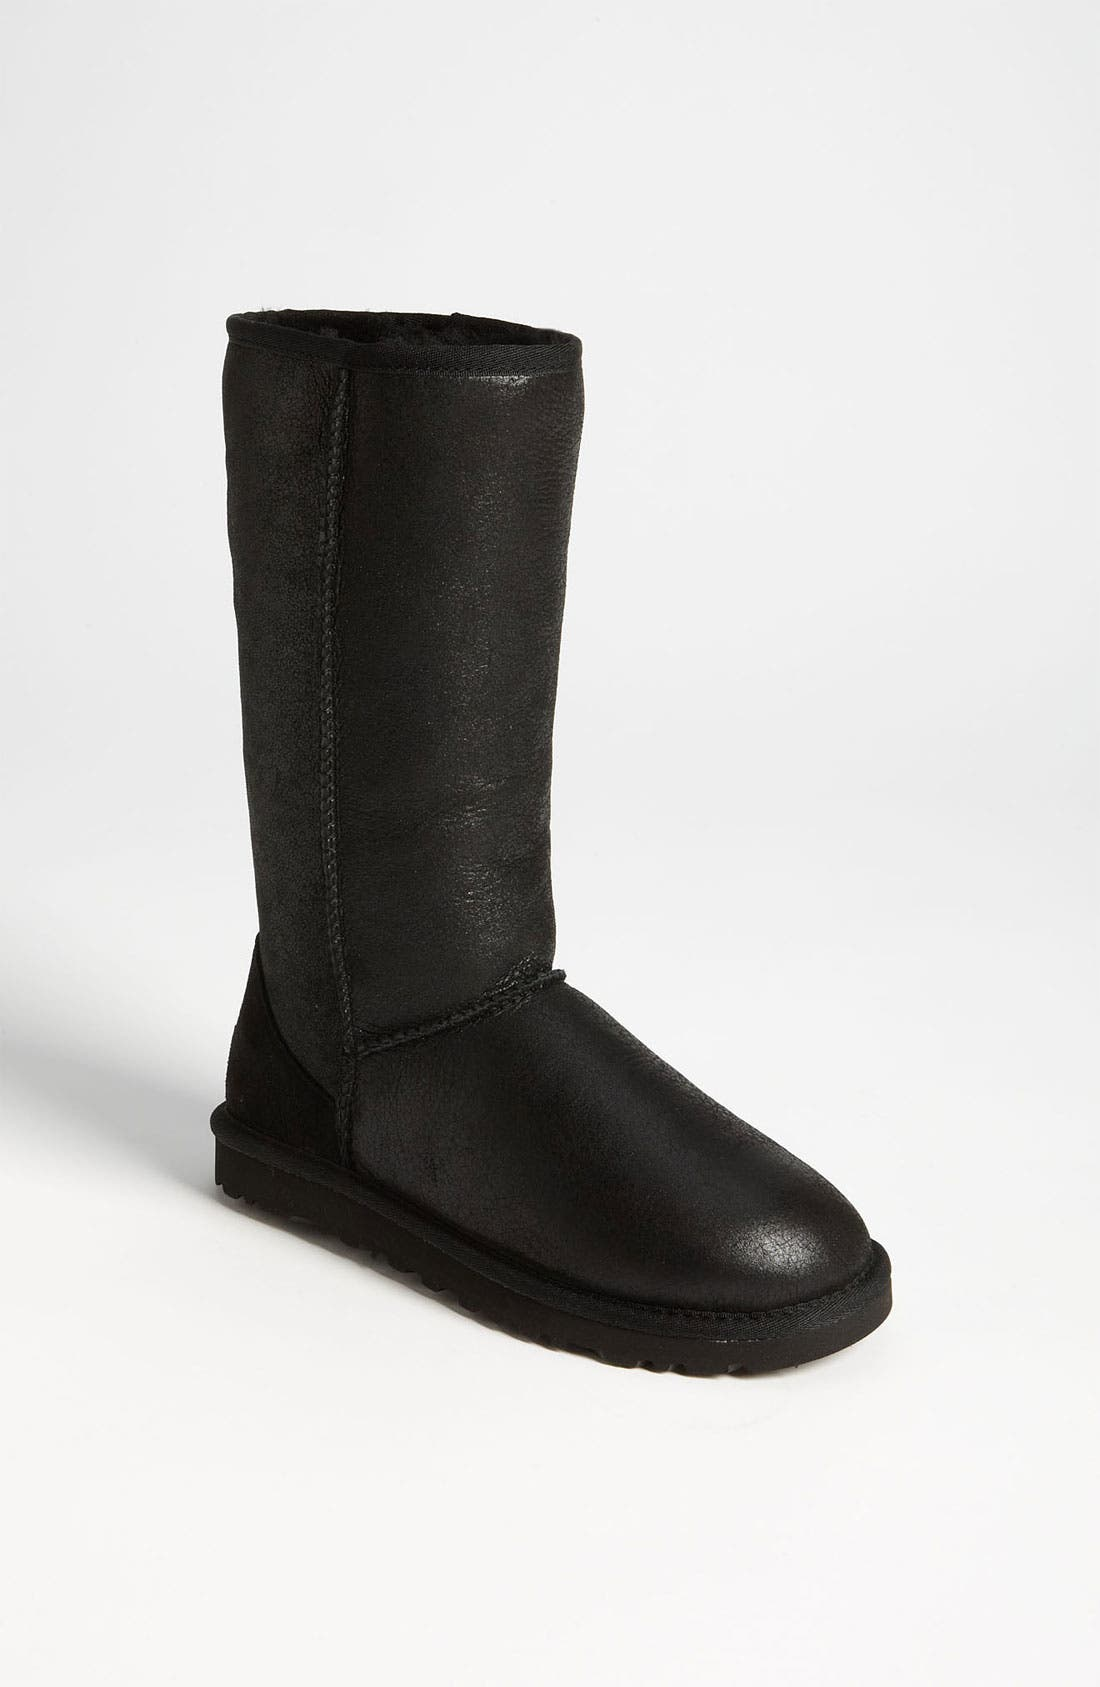 Main Image - UGG® Australia 'Classic Tall Bomber' Boot (Women)